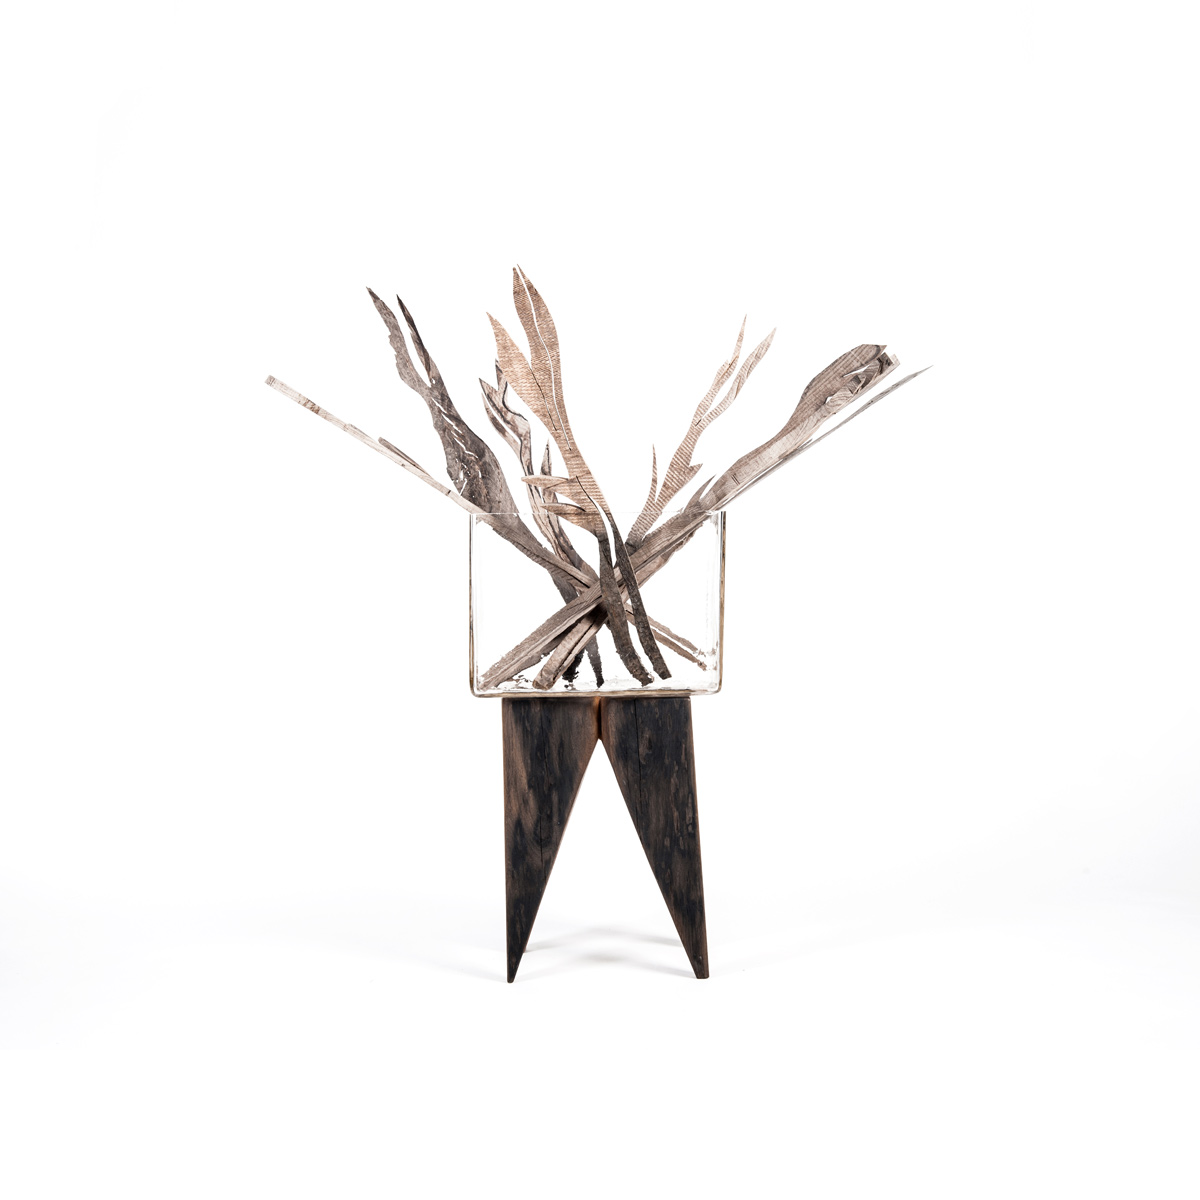 Hocker HAYMO mit Holzblumen TALIA, JK. Designermöbel